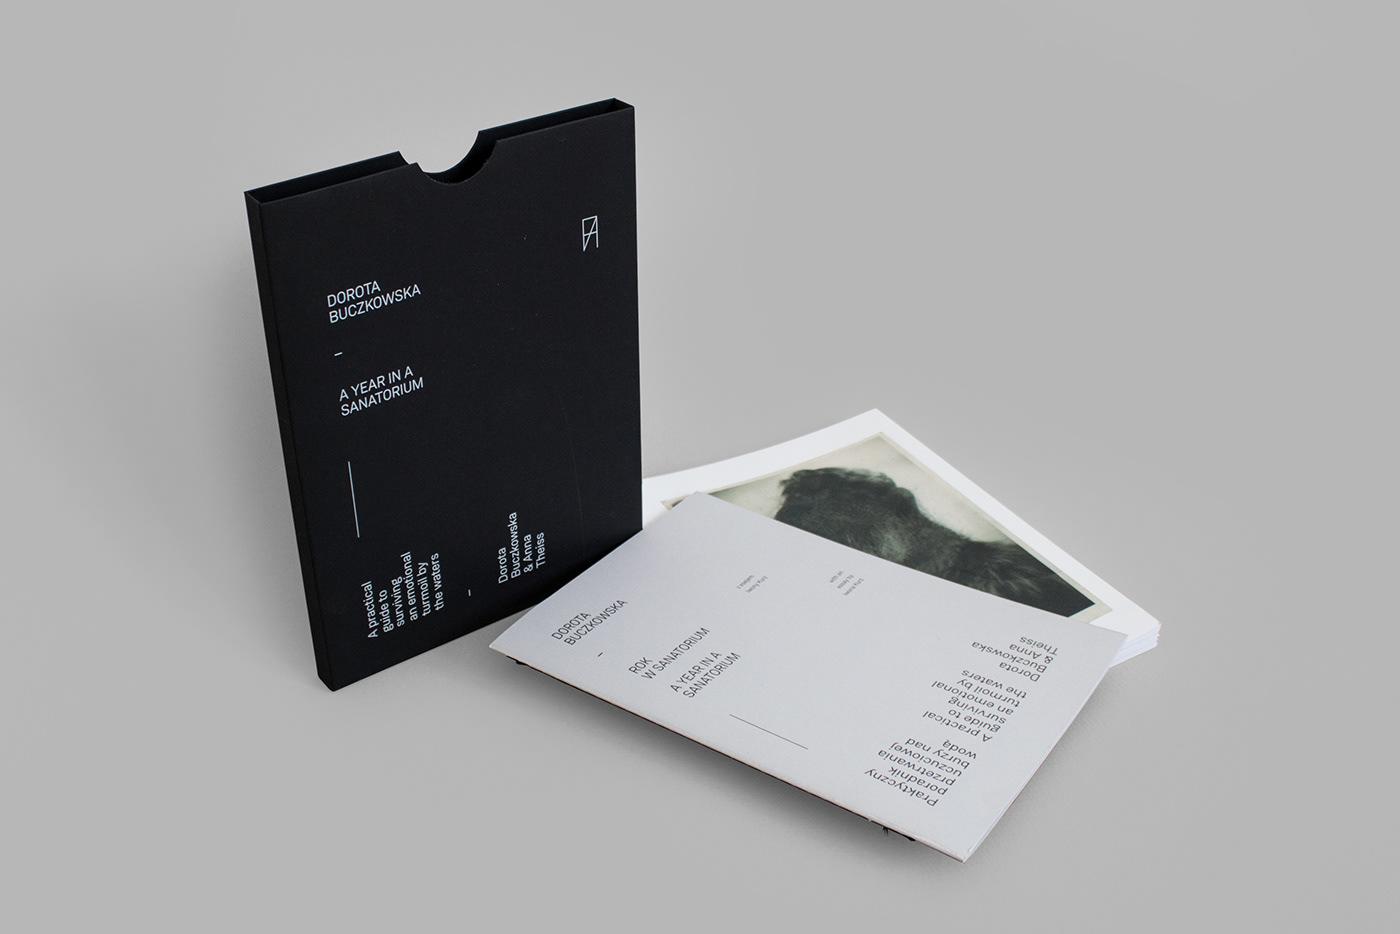 faf Dorota Buczkowska Photography  book design harmonic book photo book Album artbook